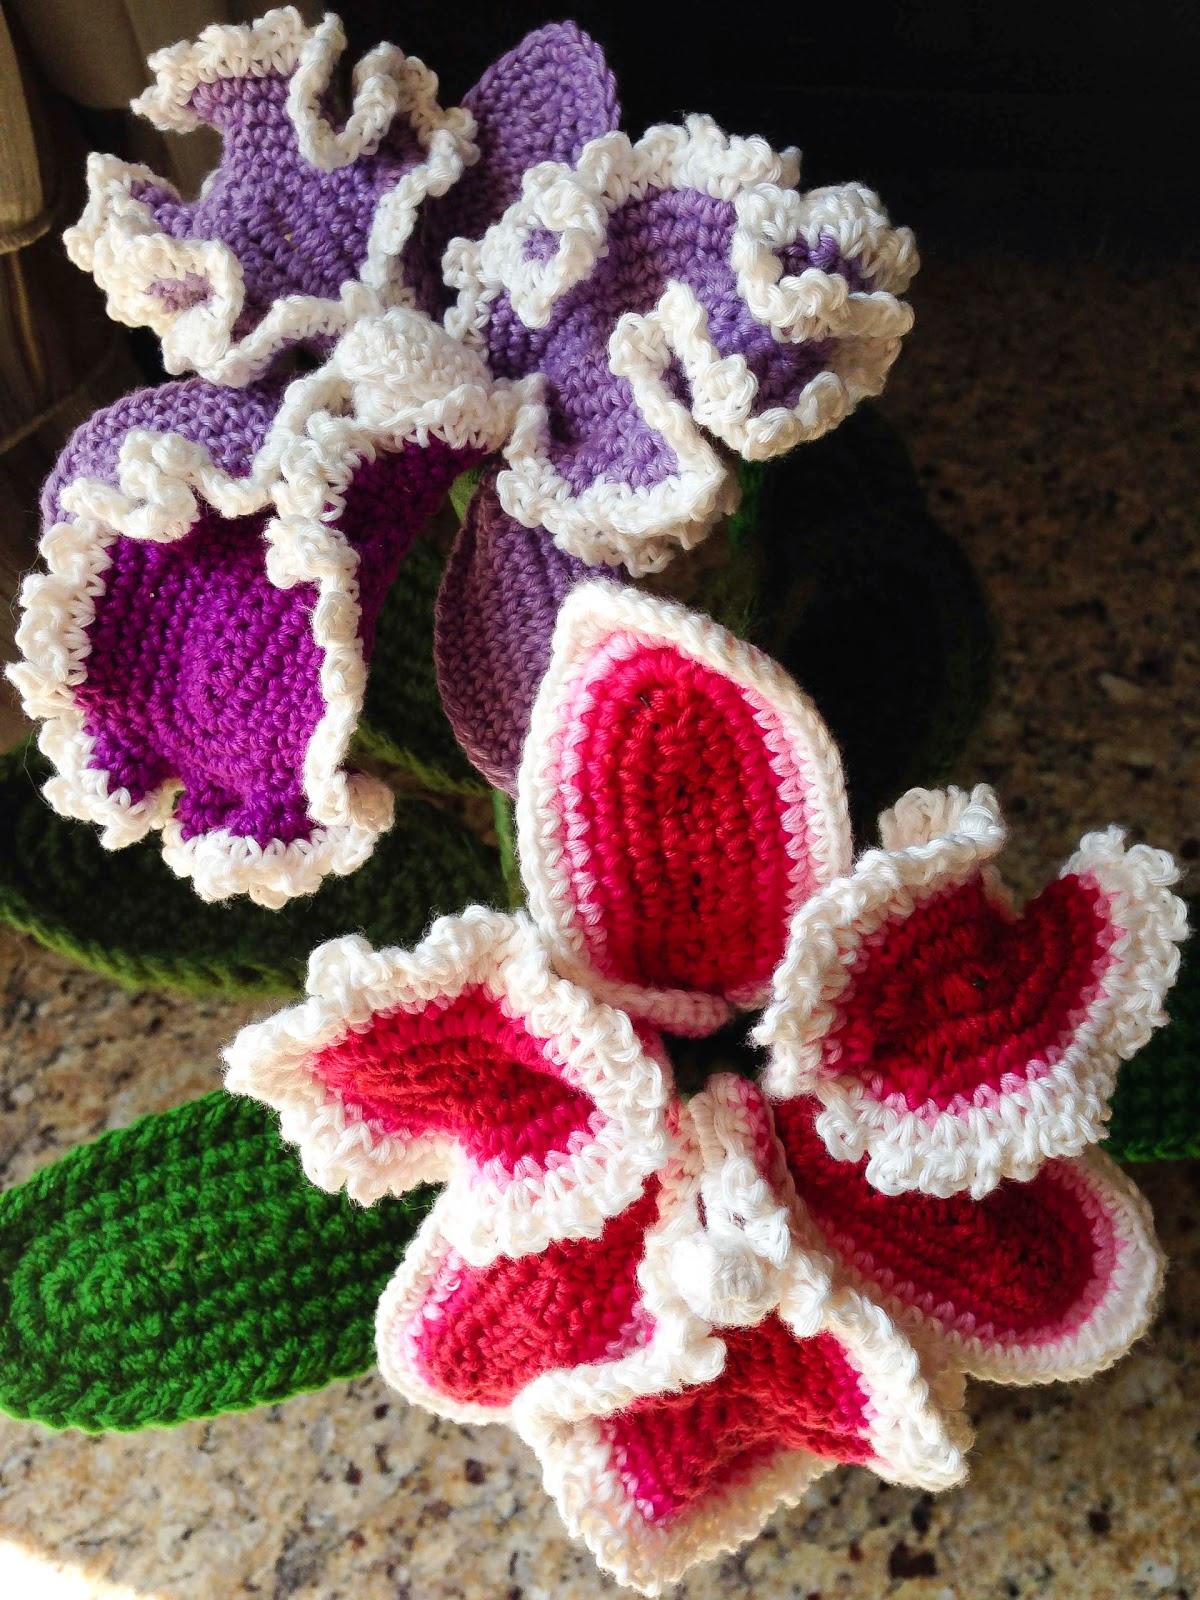 crochet rockstar: Cattleya Orchid Crochet Flower